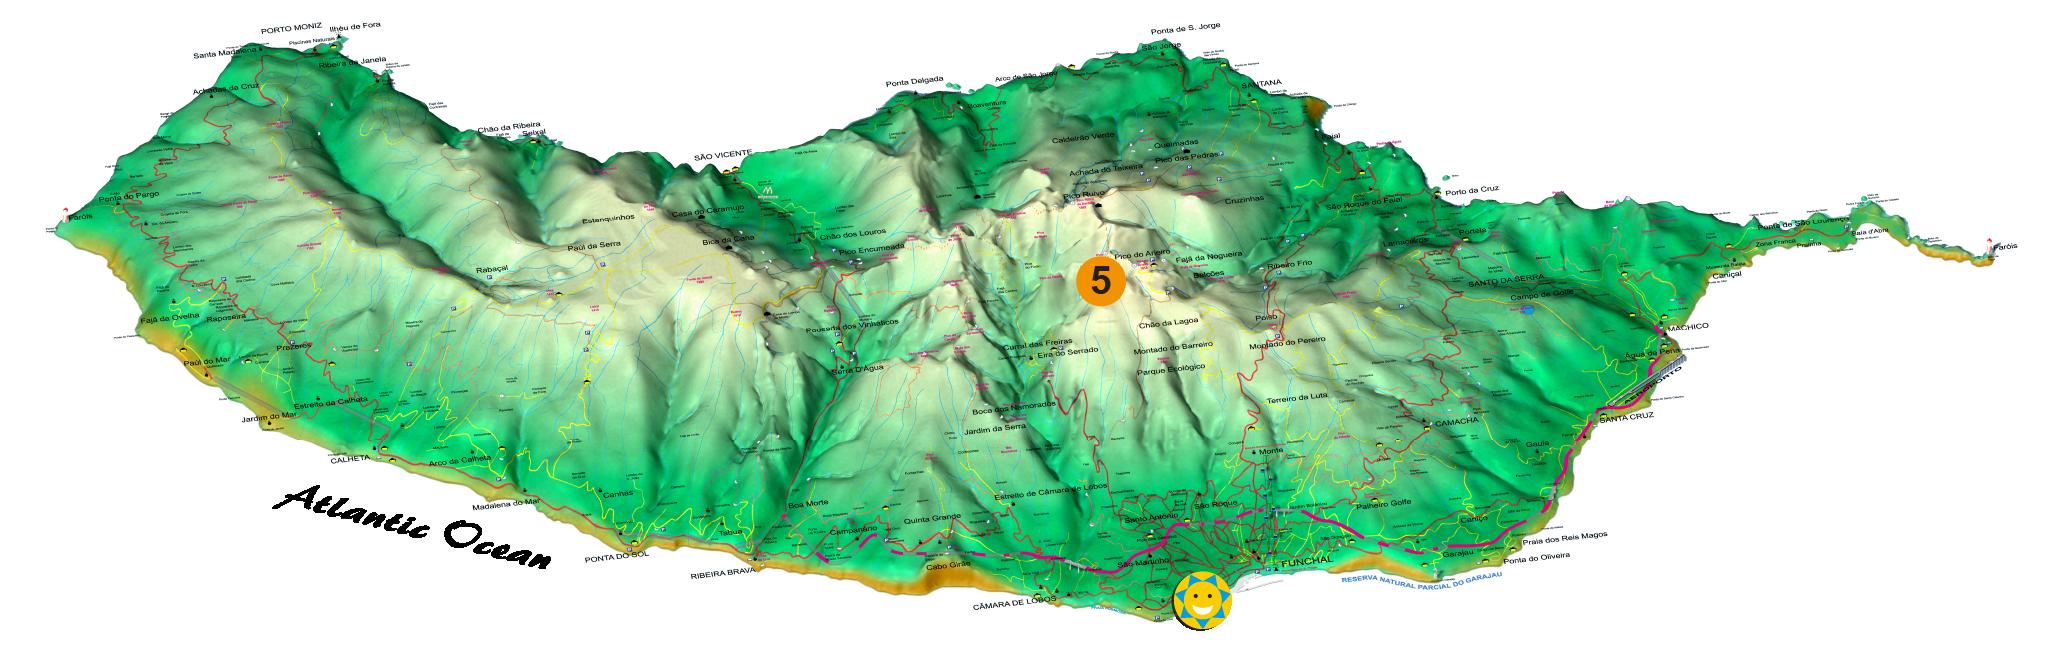 5 – Walk Pico Areeiro - Pico Ruivo - Achada do Teixeira 1